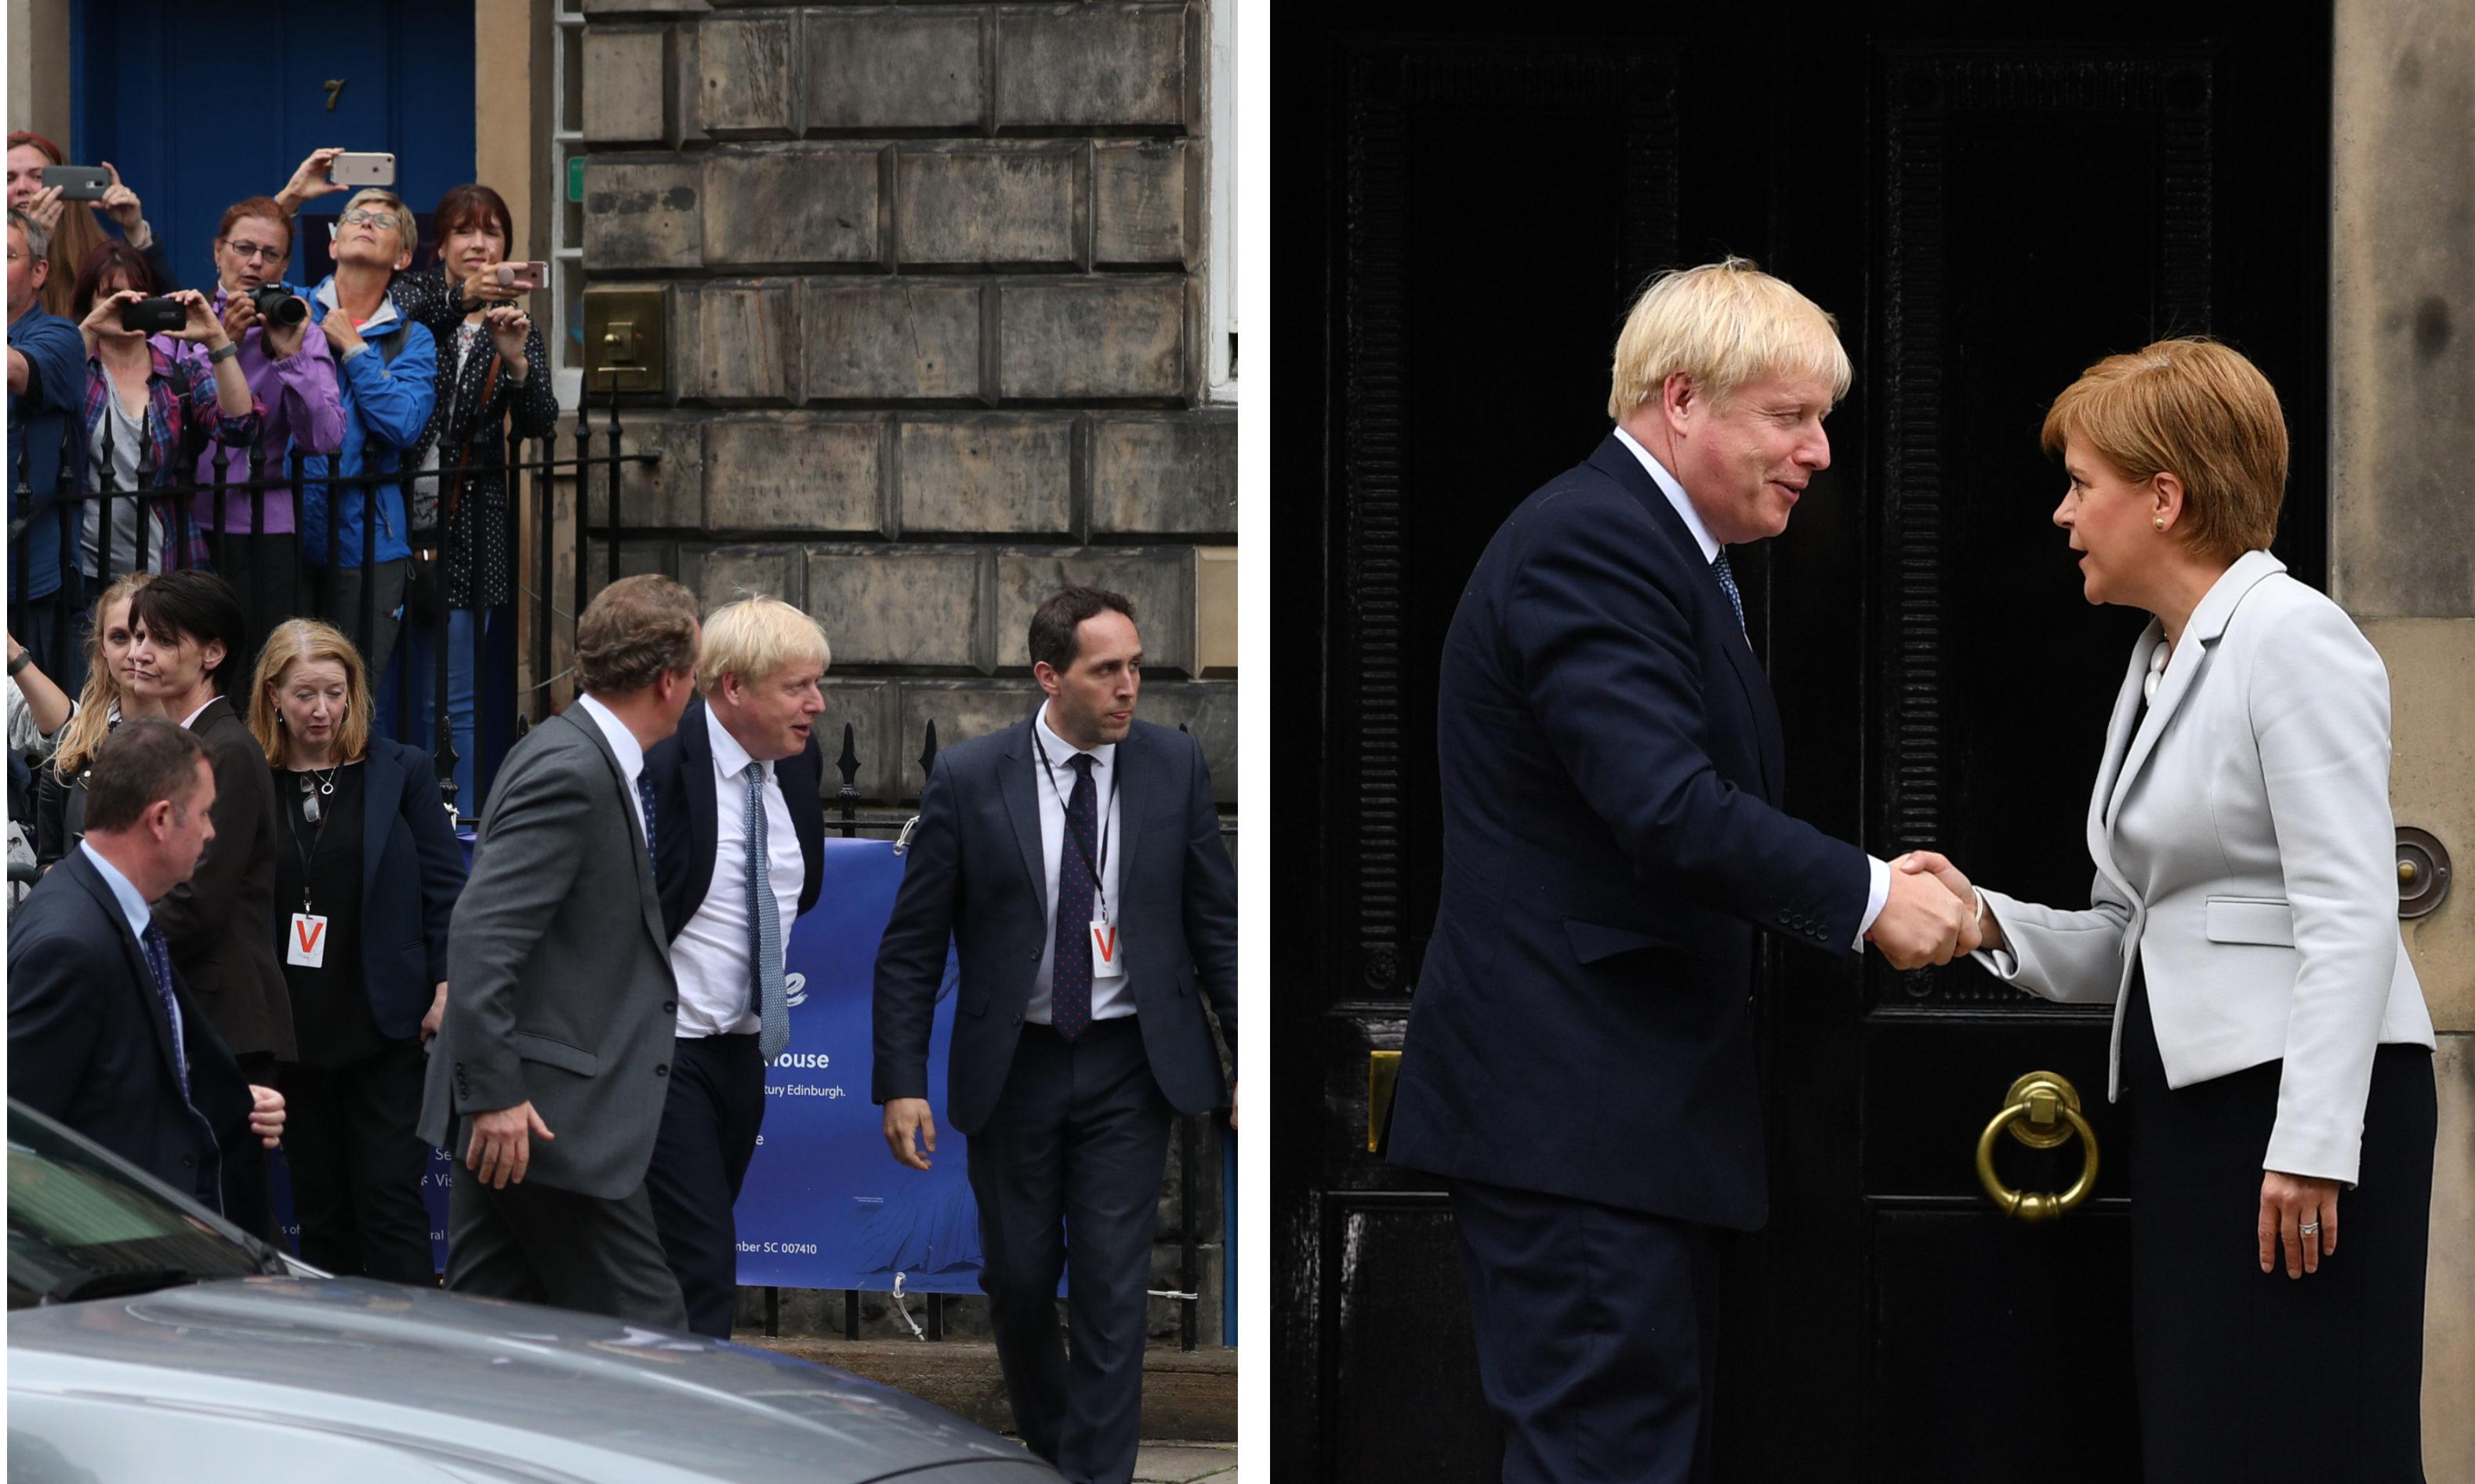 Boris Johnson arrives to meet Nicola Sturgeon at Bute House.